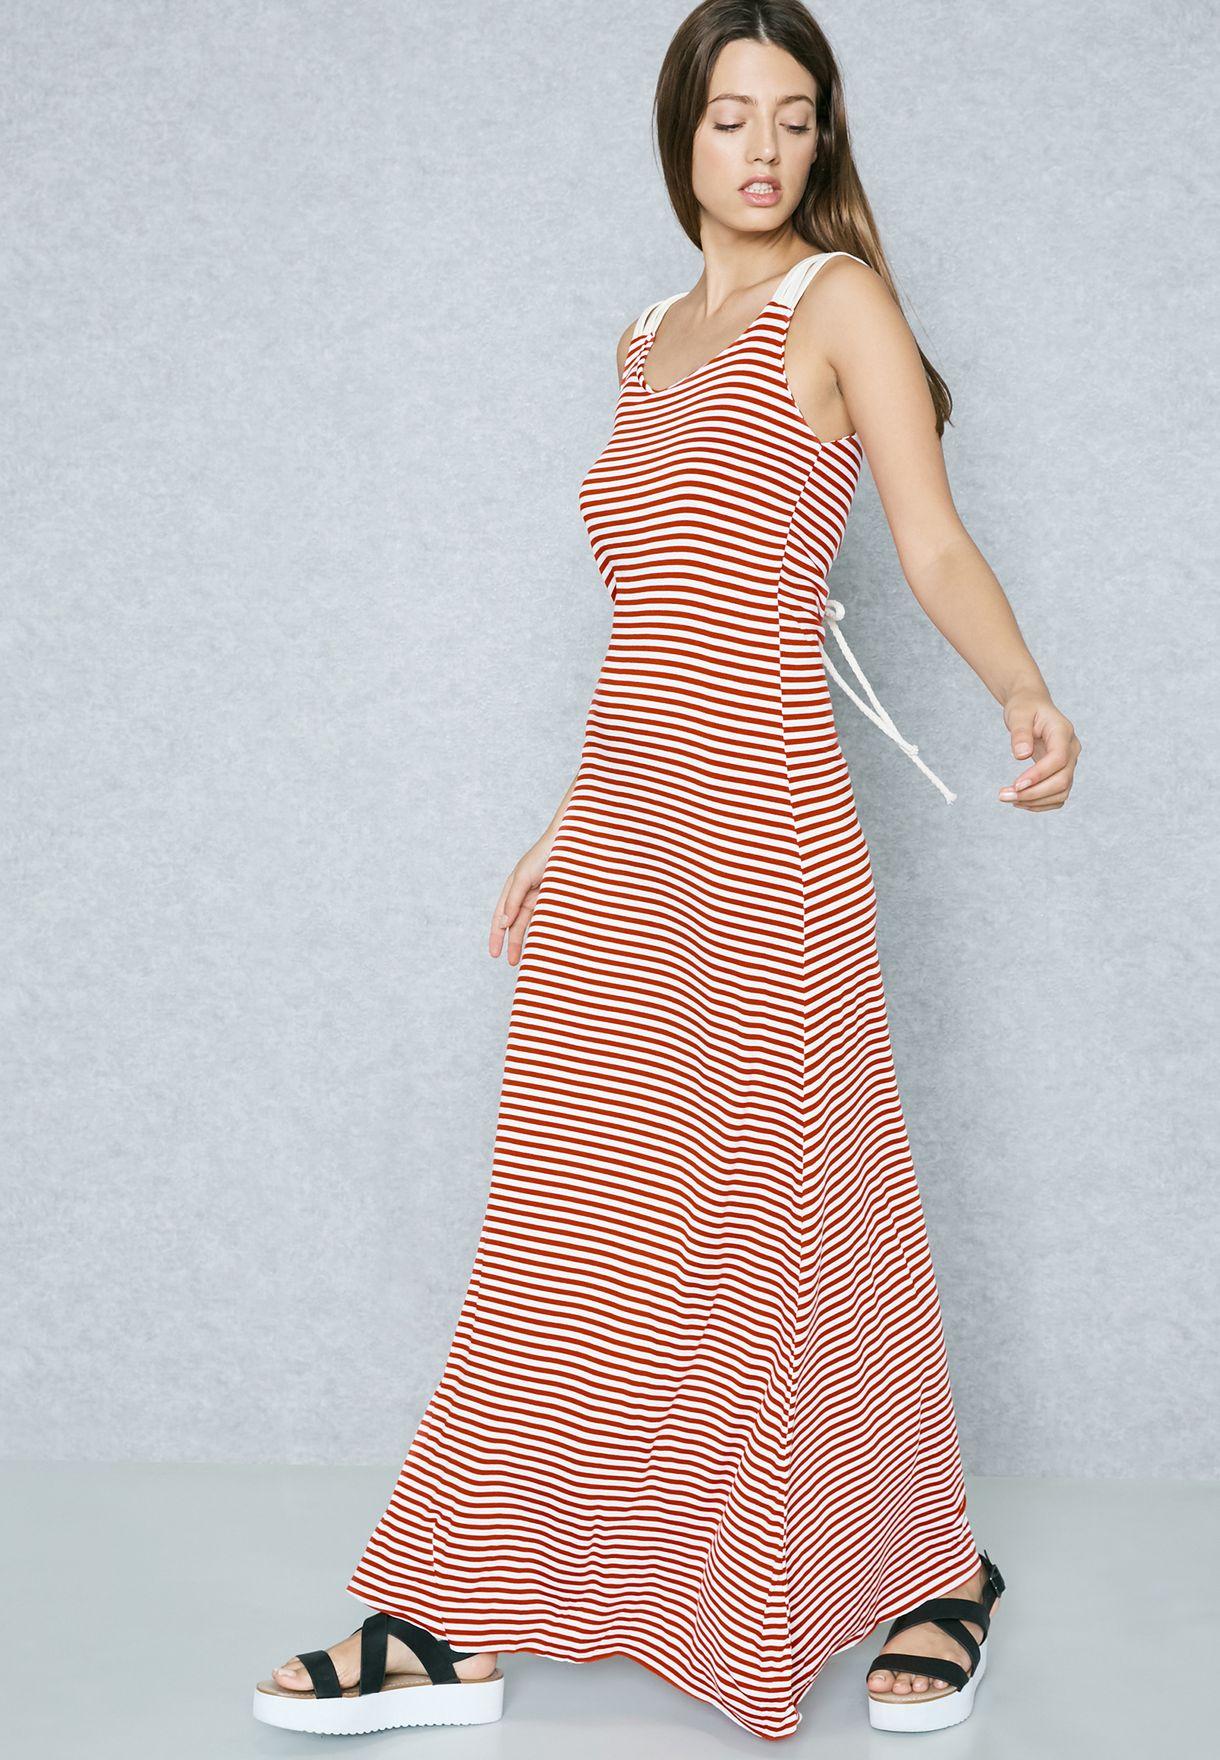 e69a0128cb1 Shop Ginger Basics prints Striped Lace Up Back Maxi Dress 3758 for ...